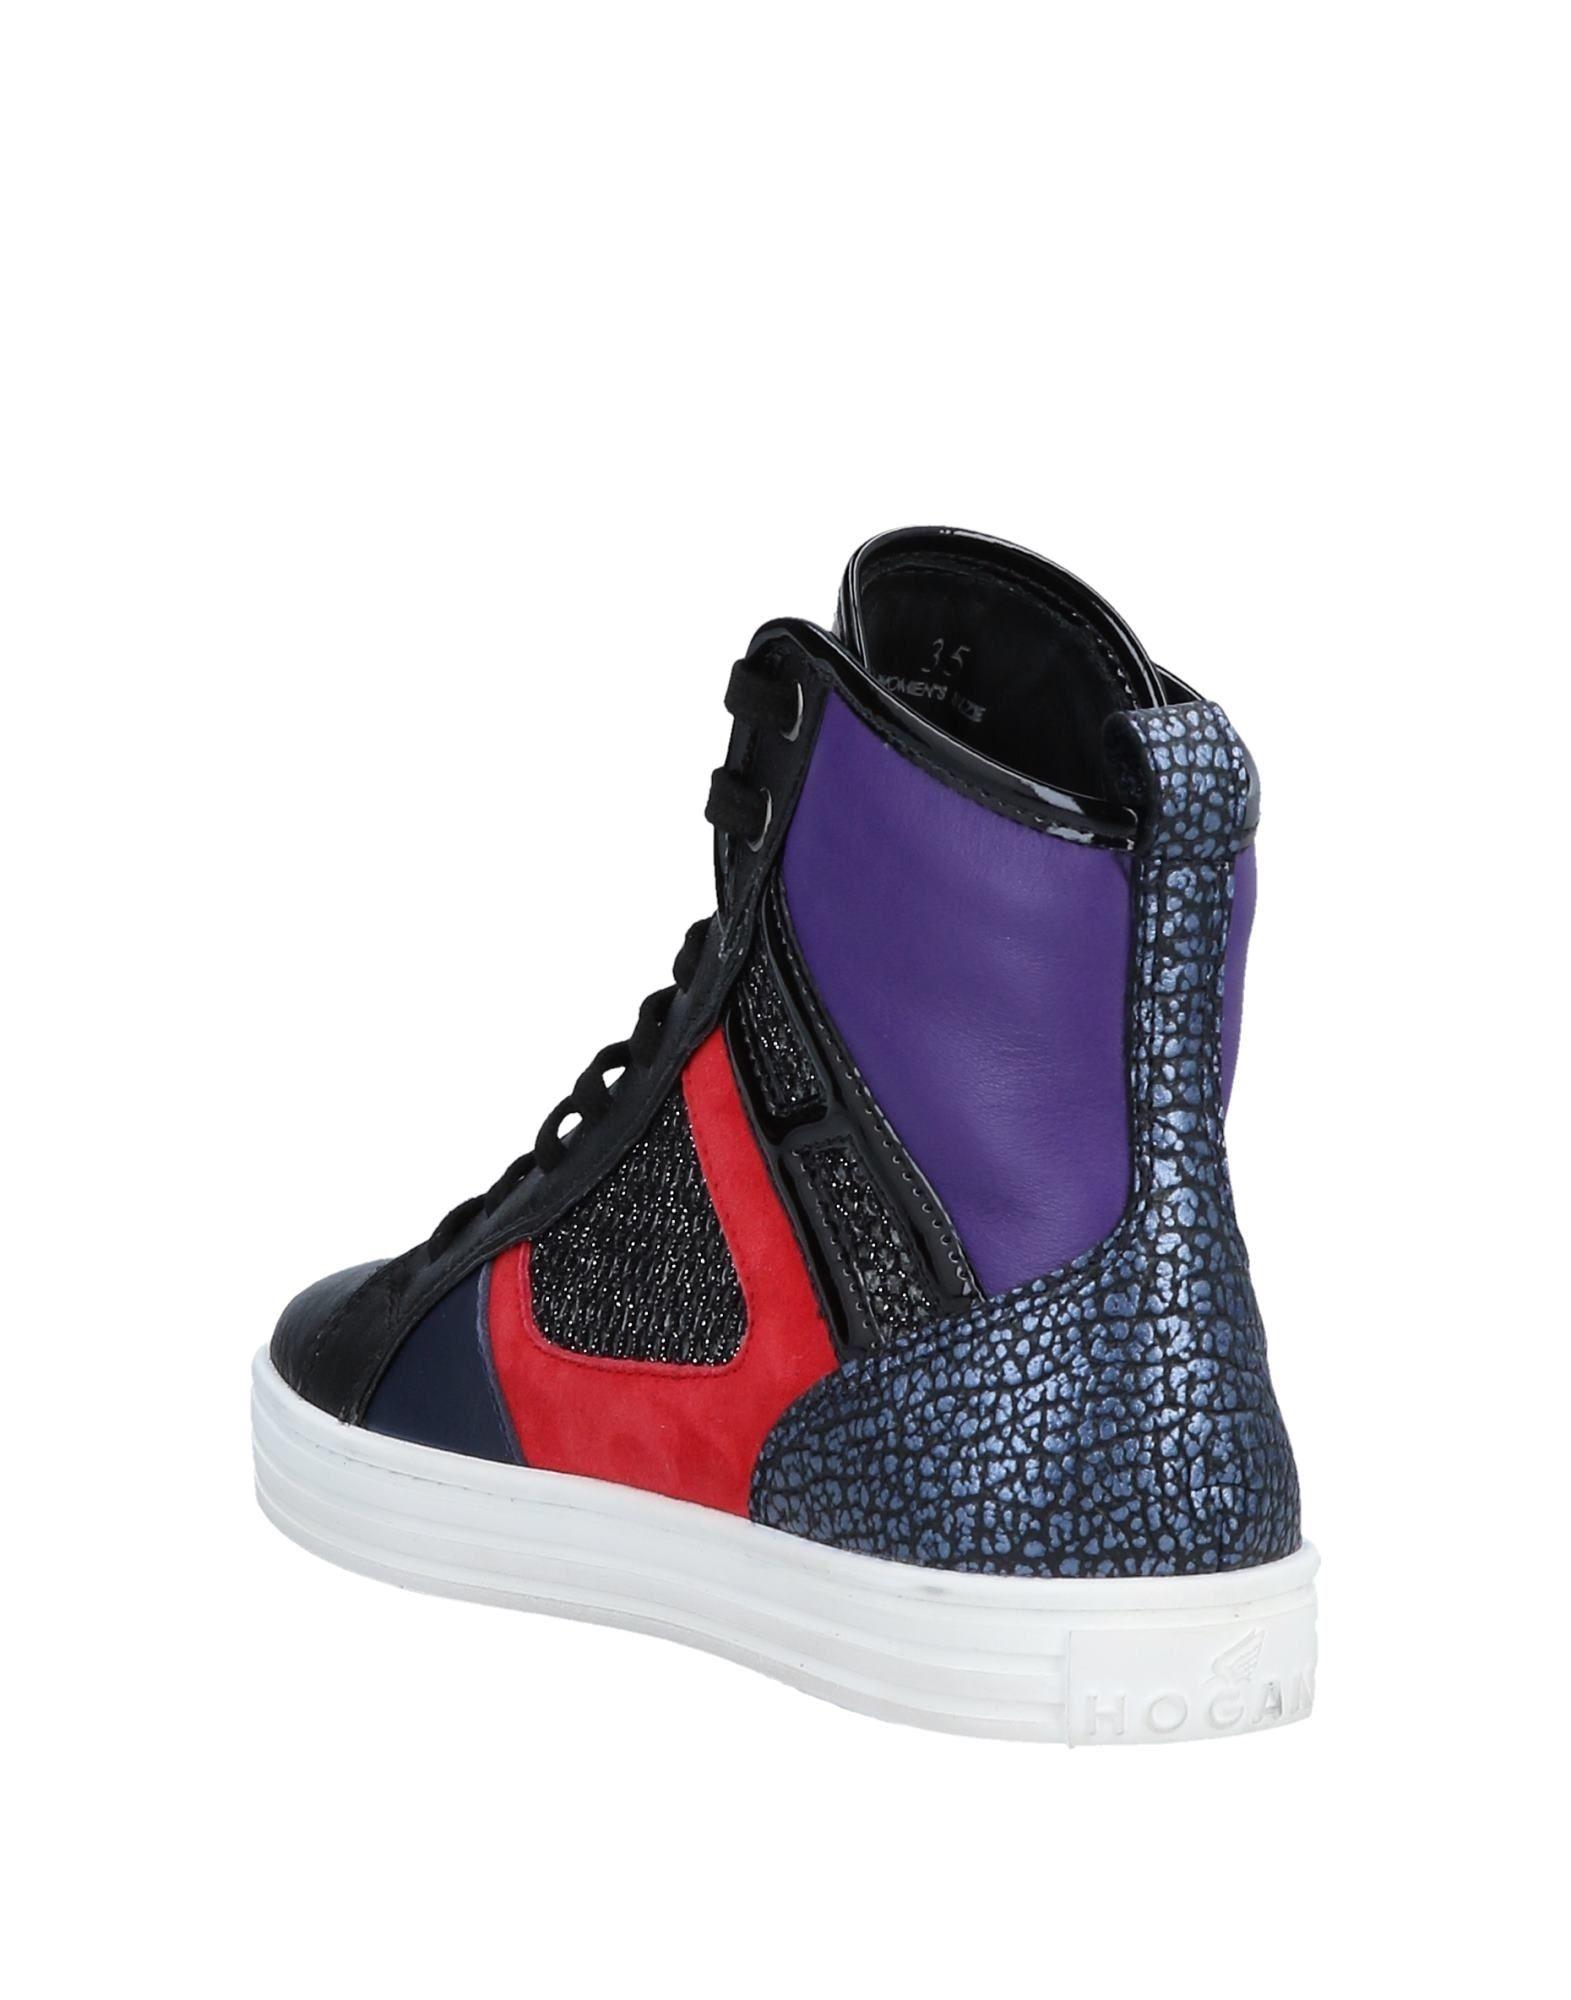 Hogan Hogan Hogan Sneakers - Women Hogan Sneakers online on  United Kingdom - 11568981XC 2d2683